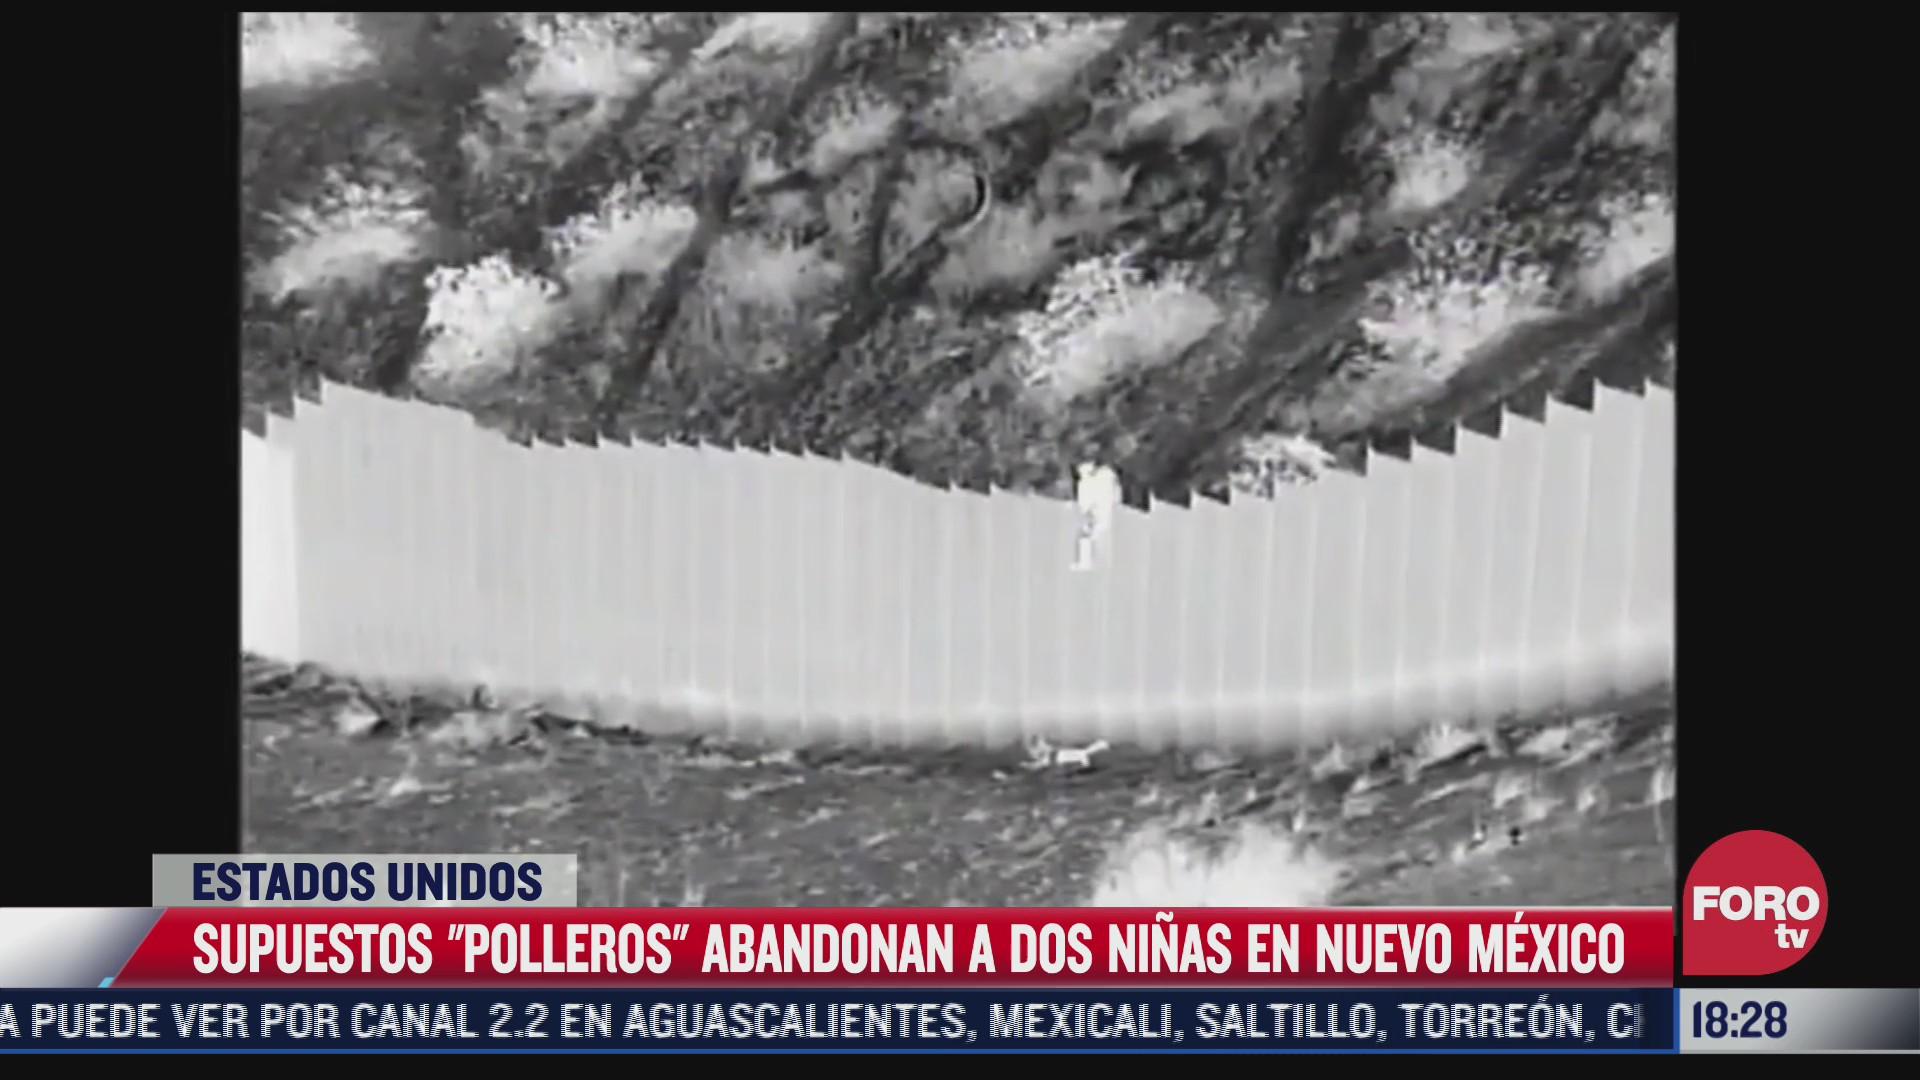 presuntos polleros abandonan a dos ninas en nuevo mexico